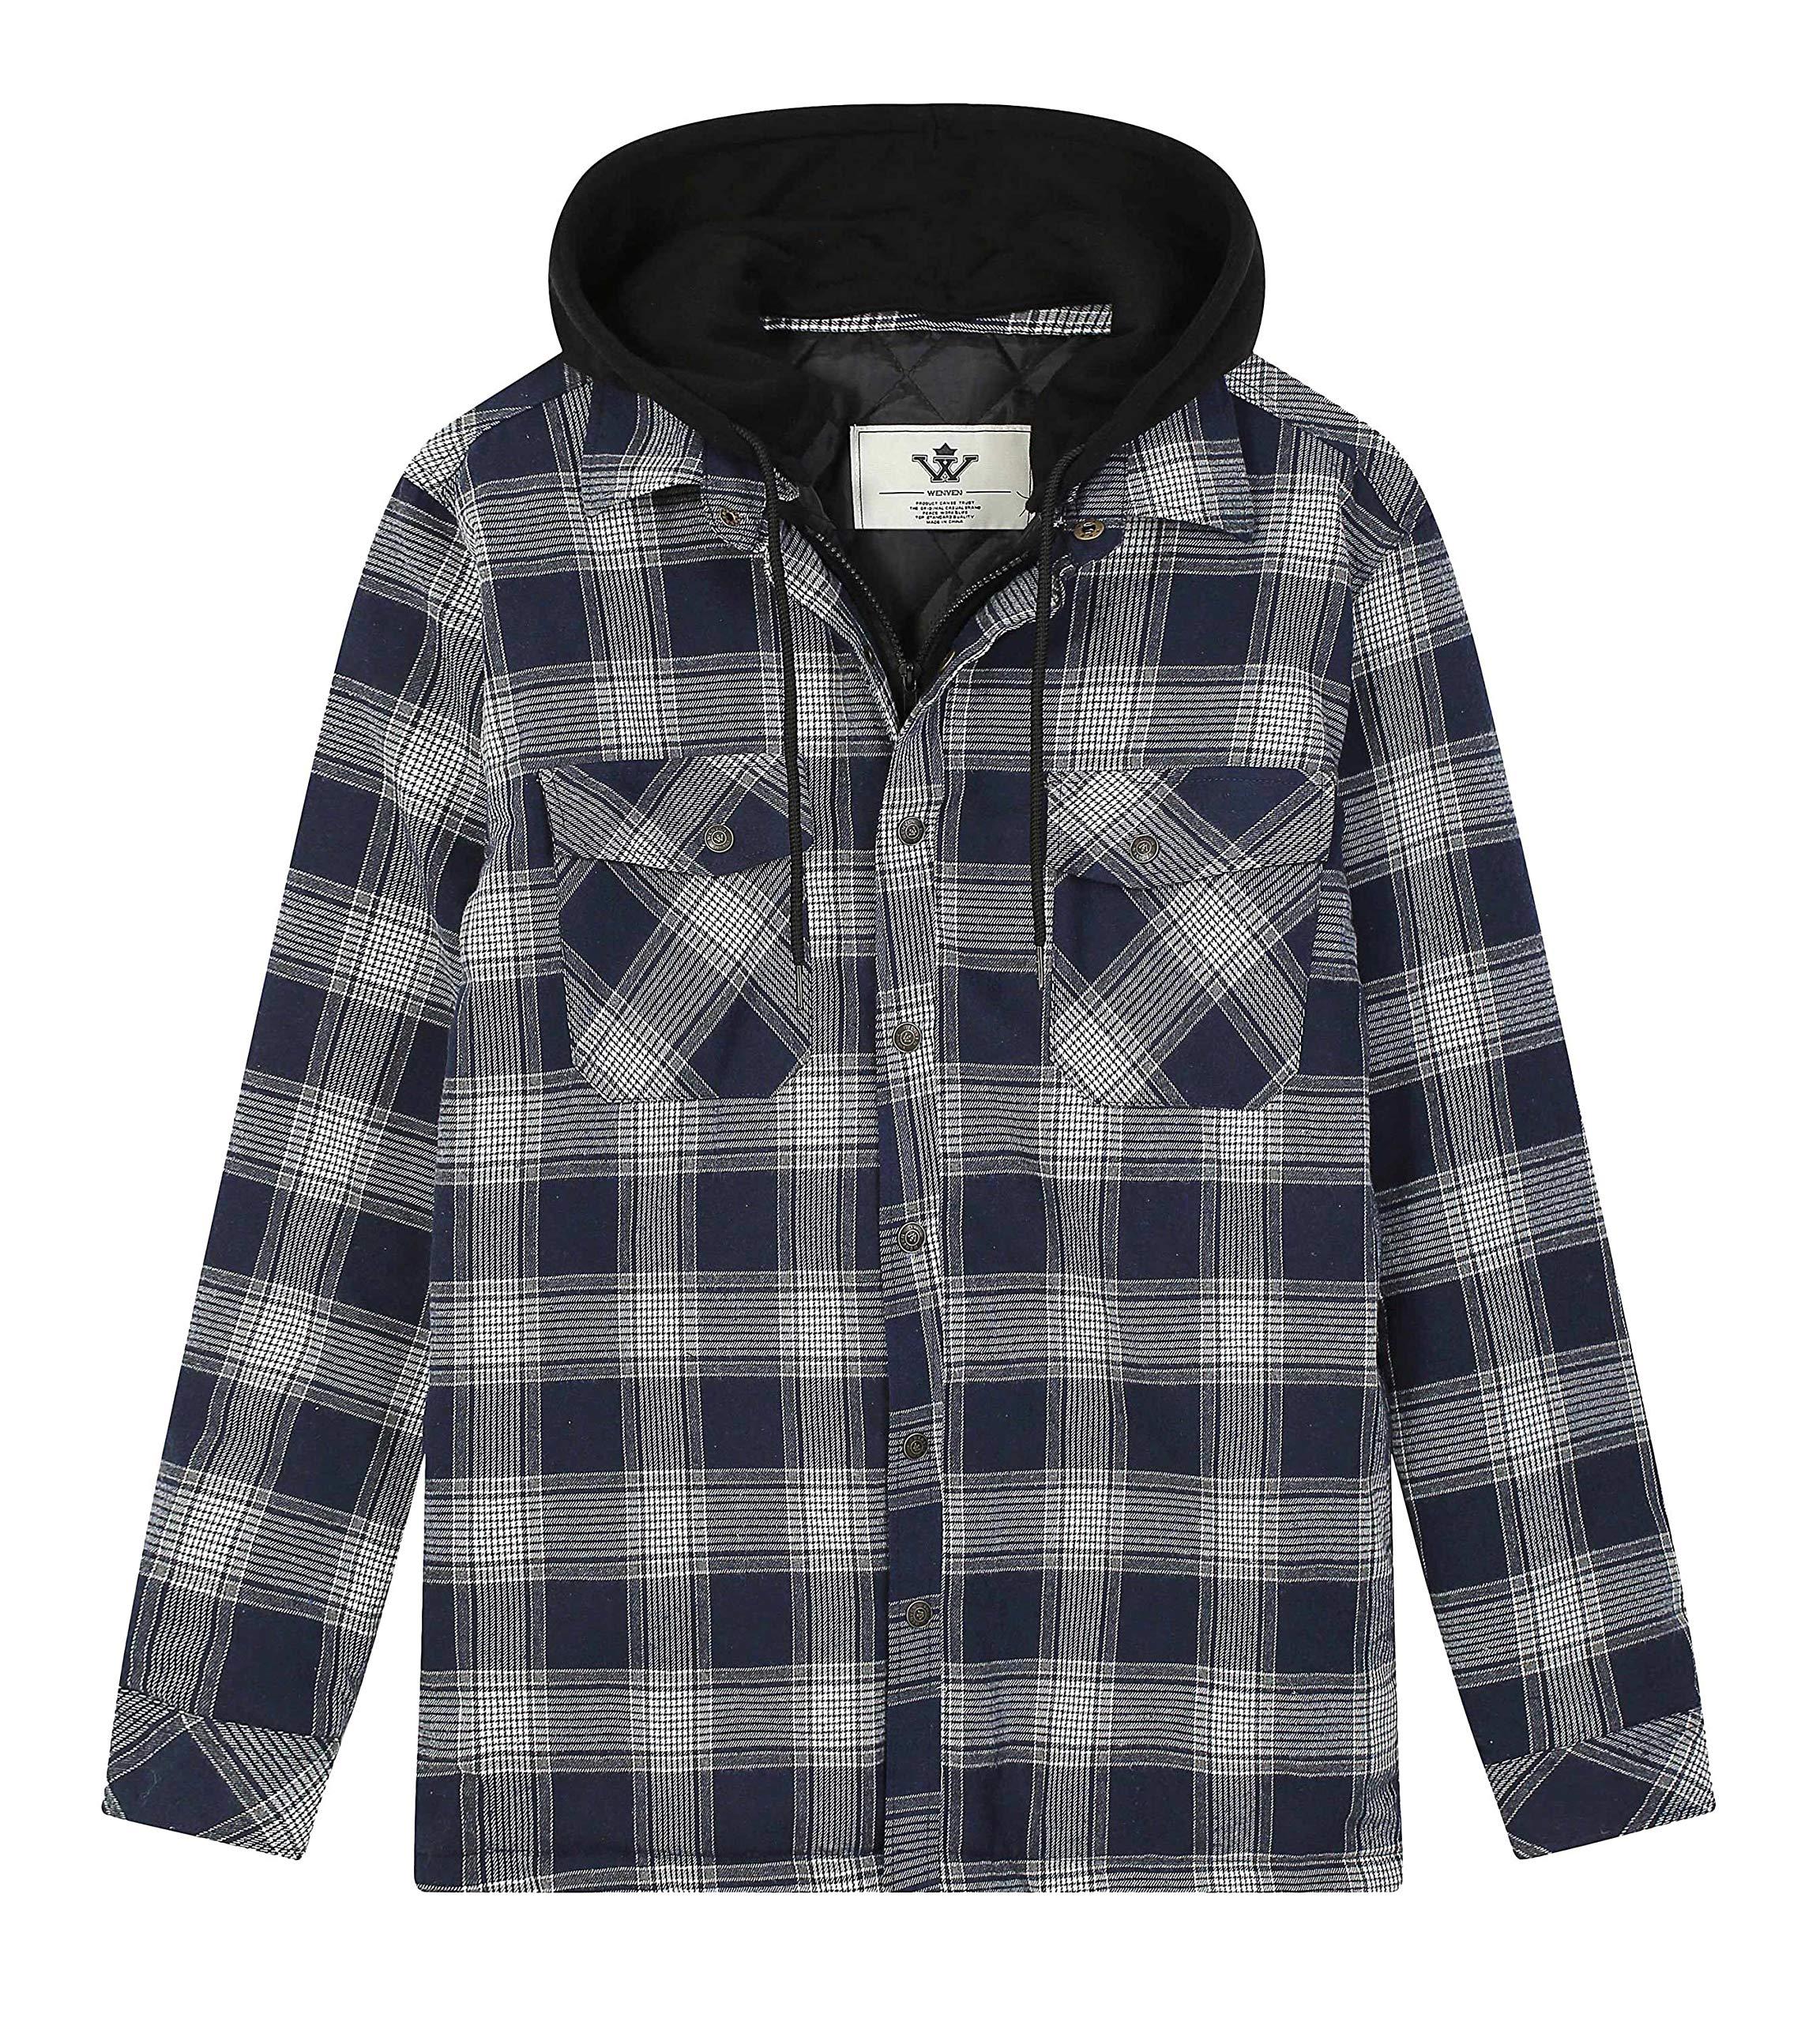 WenVen Men's Thicken Plaid Flannel Quilted Overshirt with Hood (L,Dark Blue) by WenVen